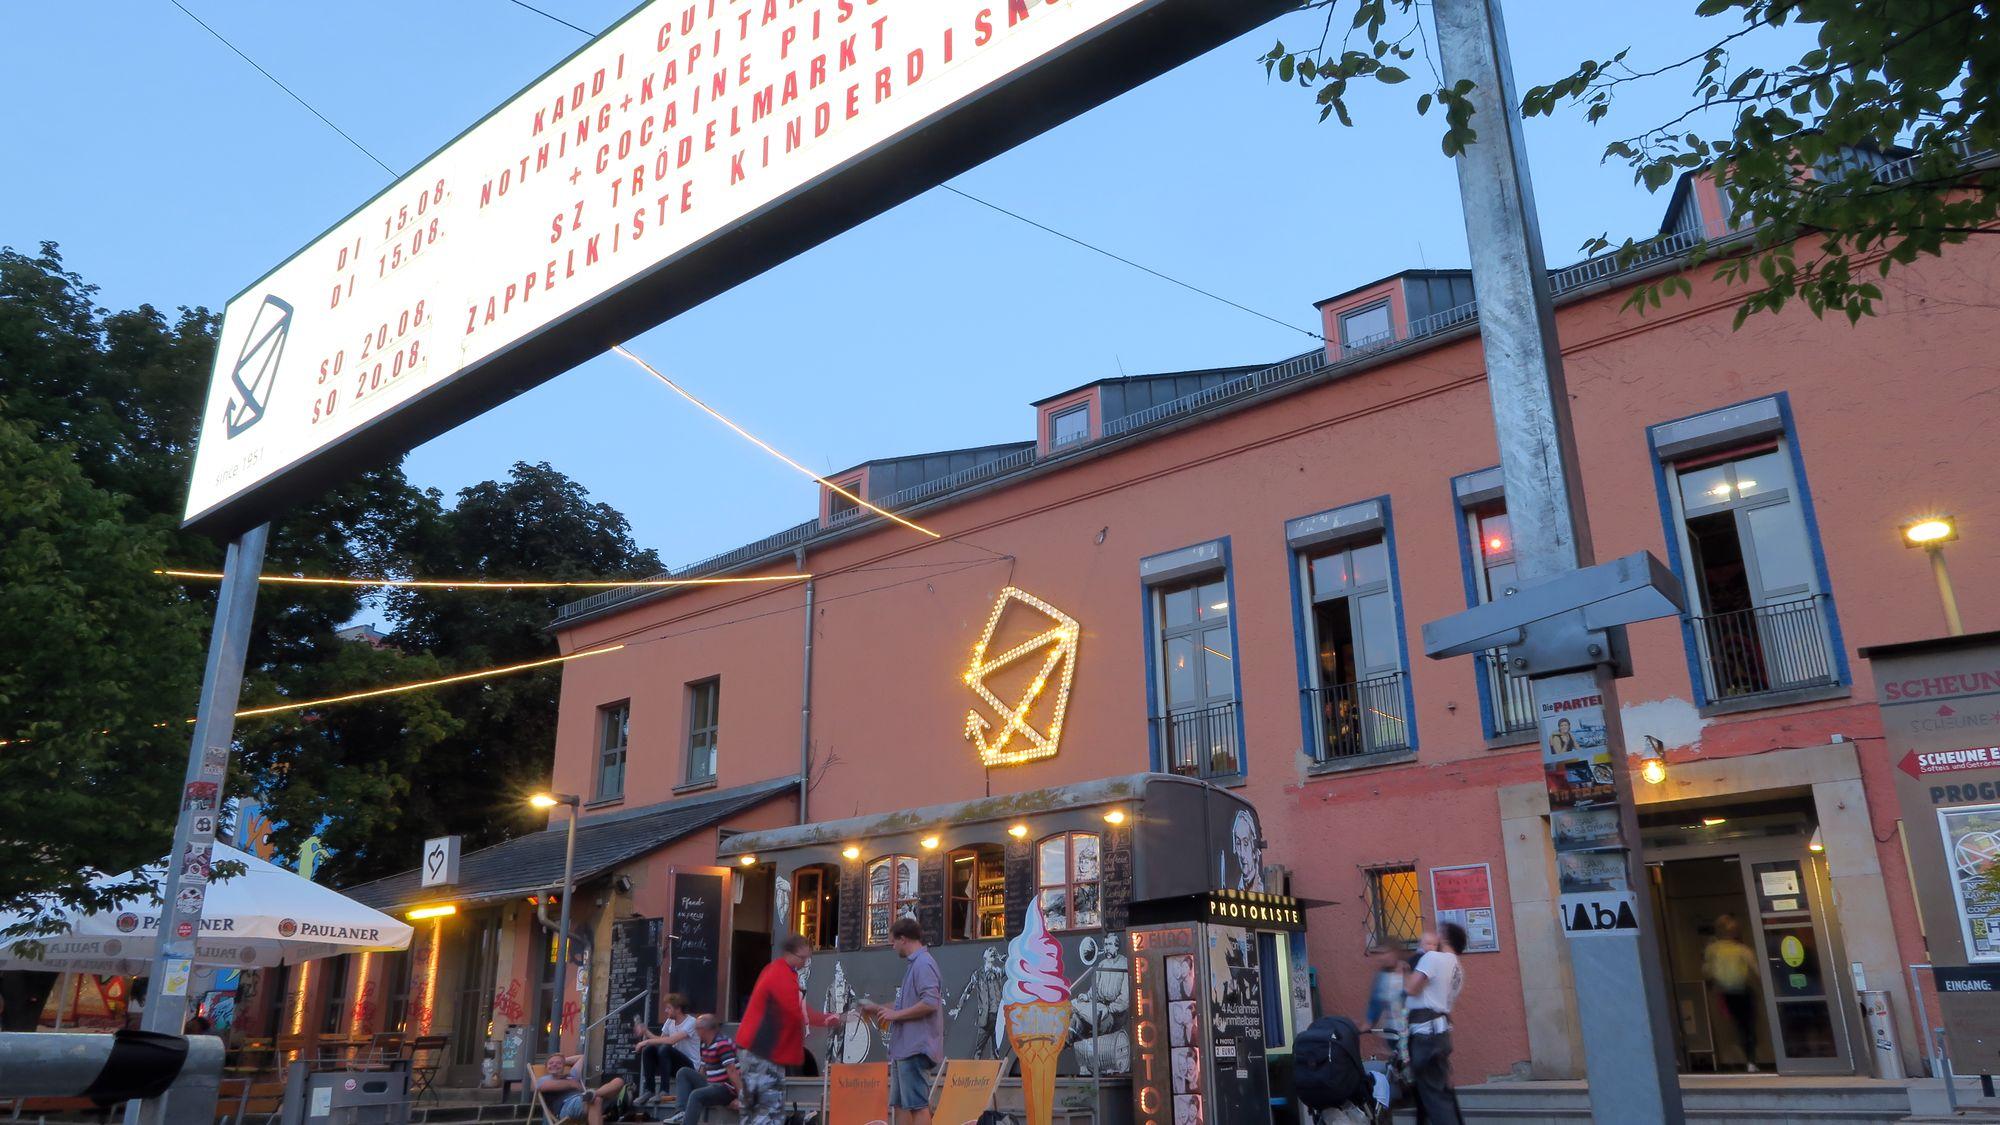 Scheune Umbau Geplant Neustadt Gefluster